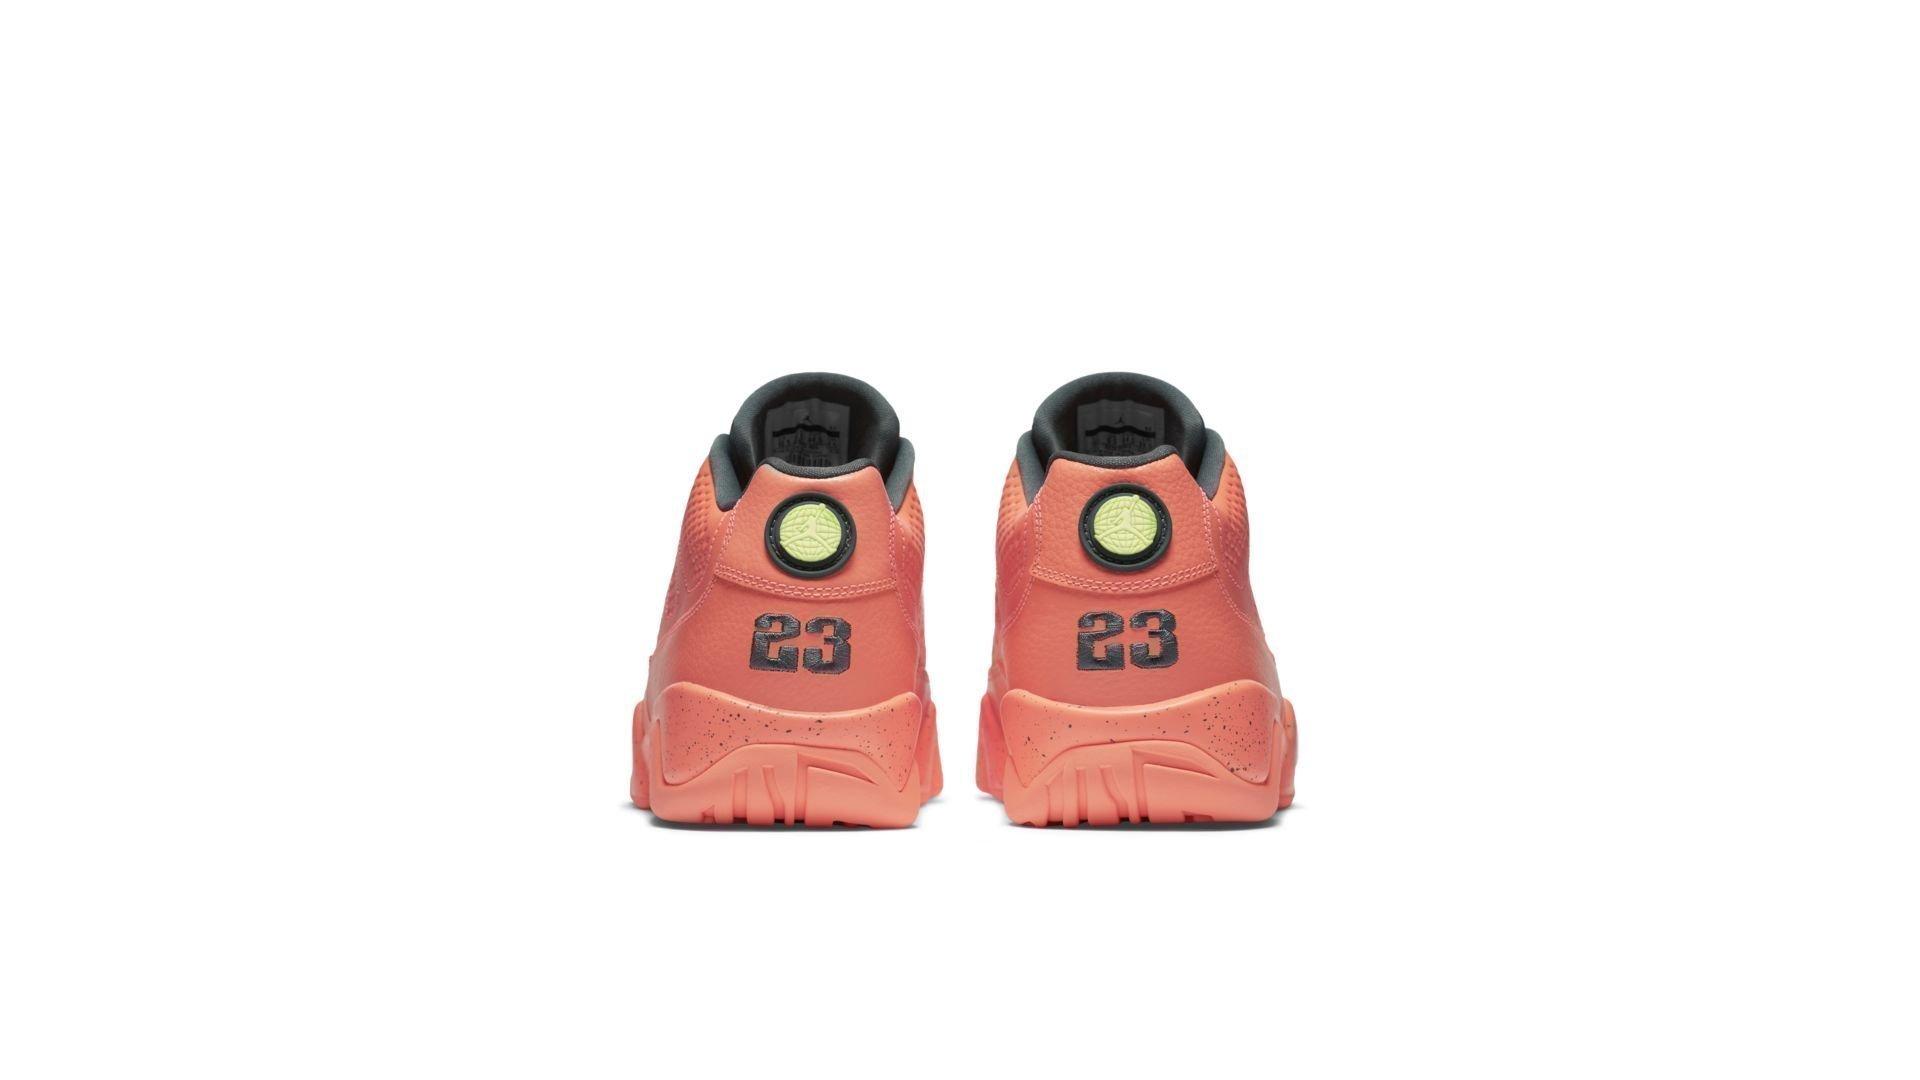 Jordan 9 Retro Low Bright Mango (832822-805)